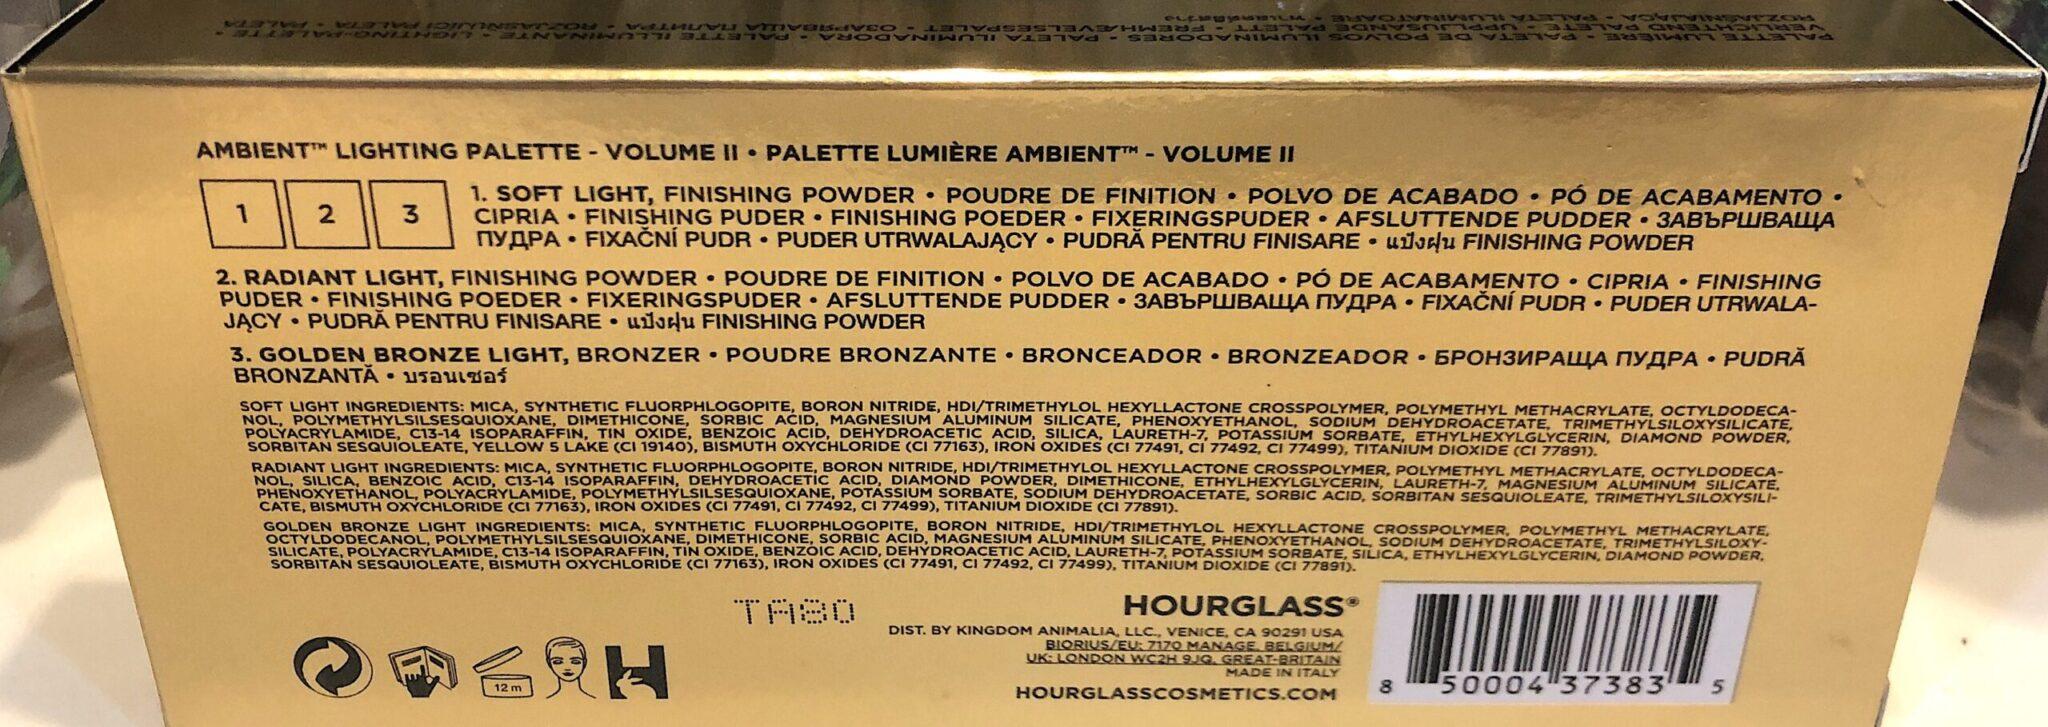 HOURGLASS AMBIENT LIGHTING PALETTE VOL 11 INGREDIENTS